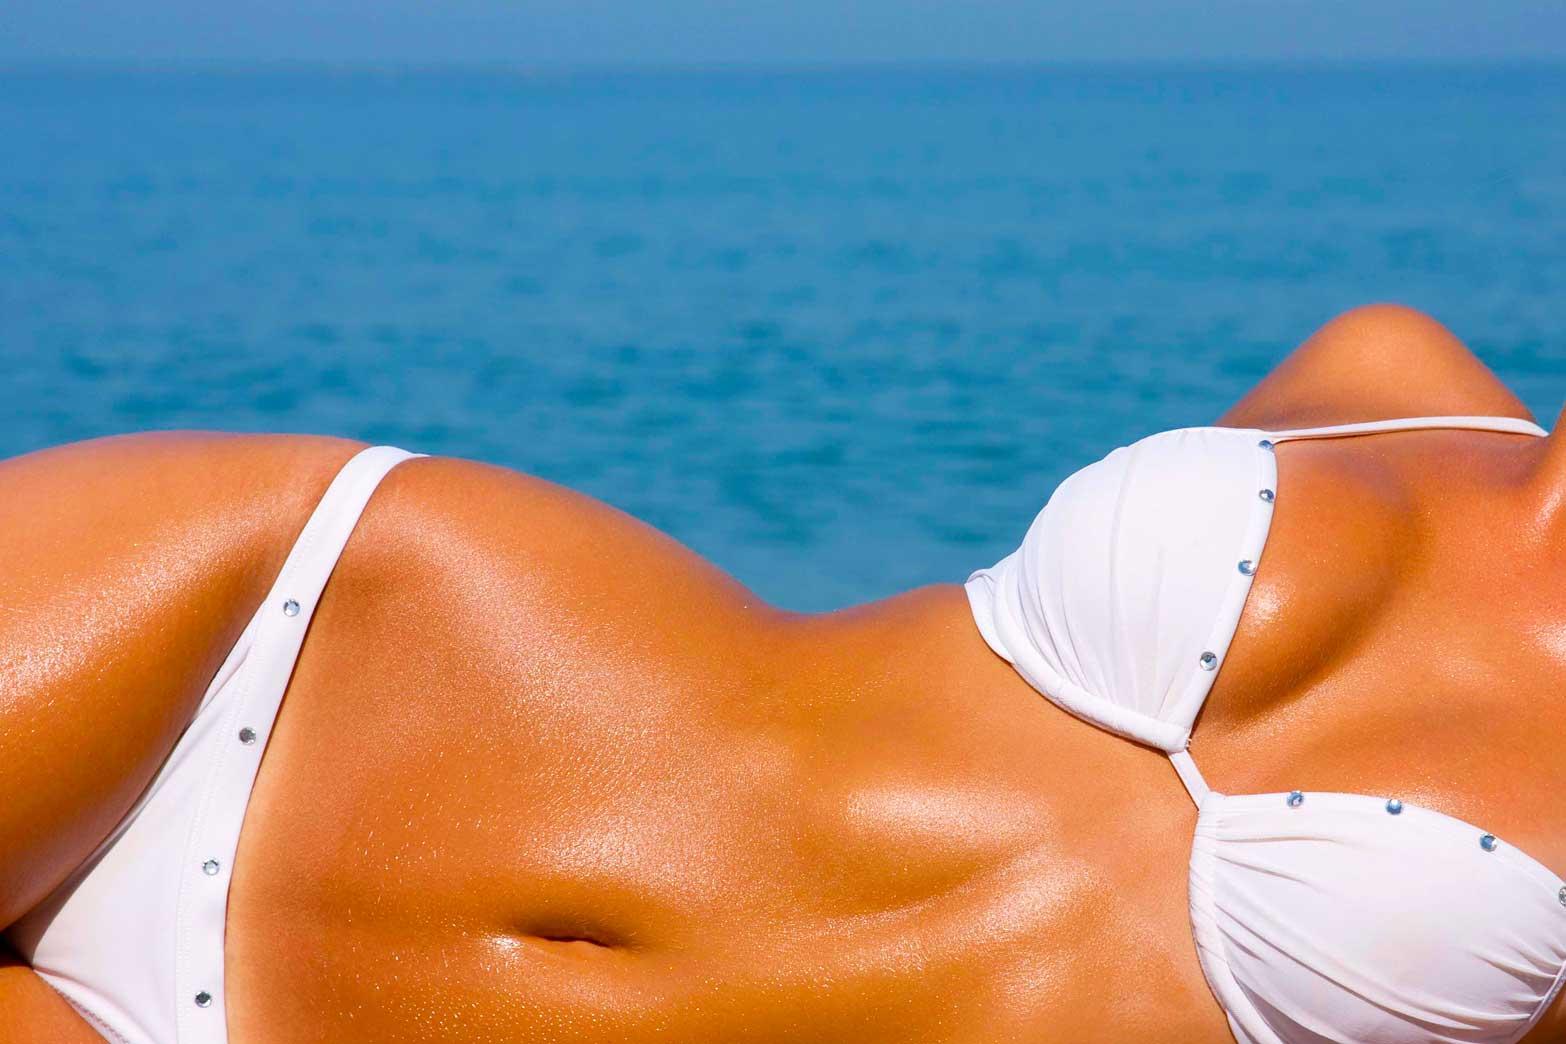 Breast augmentation advice